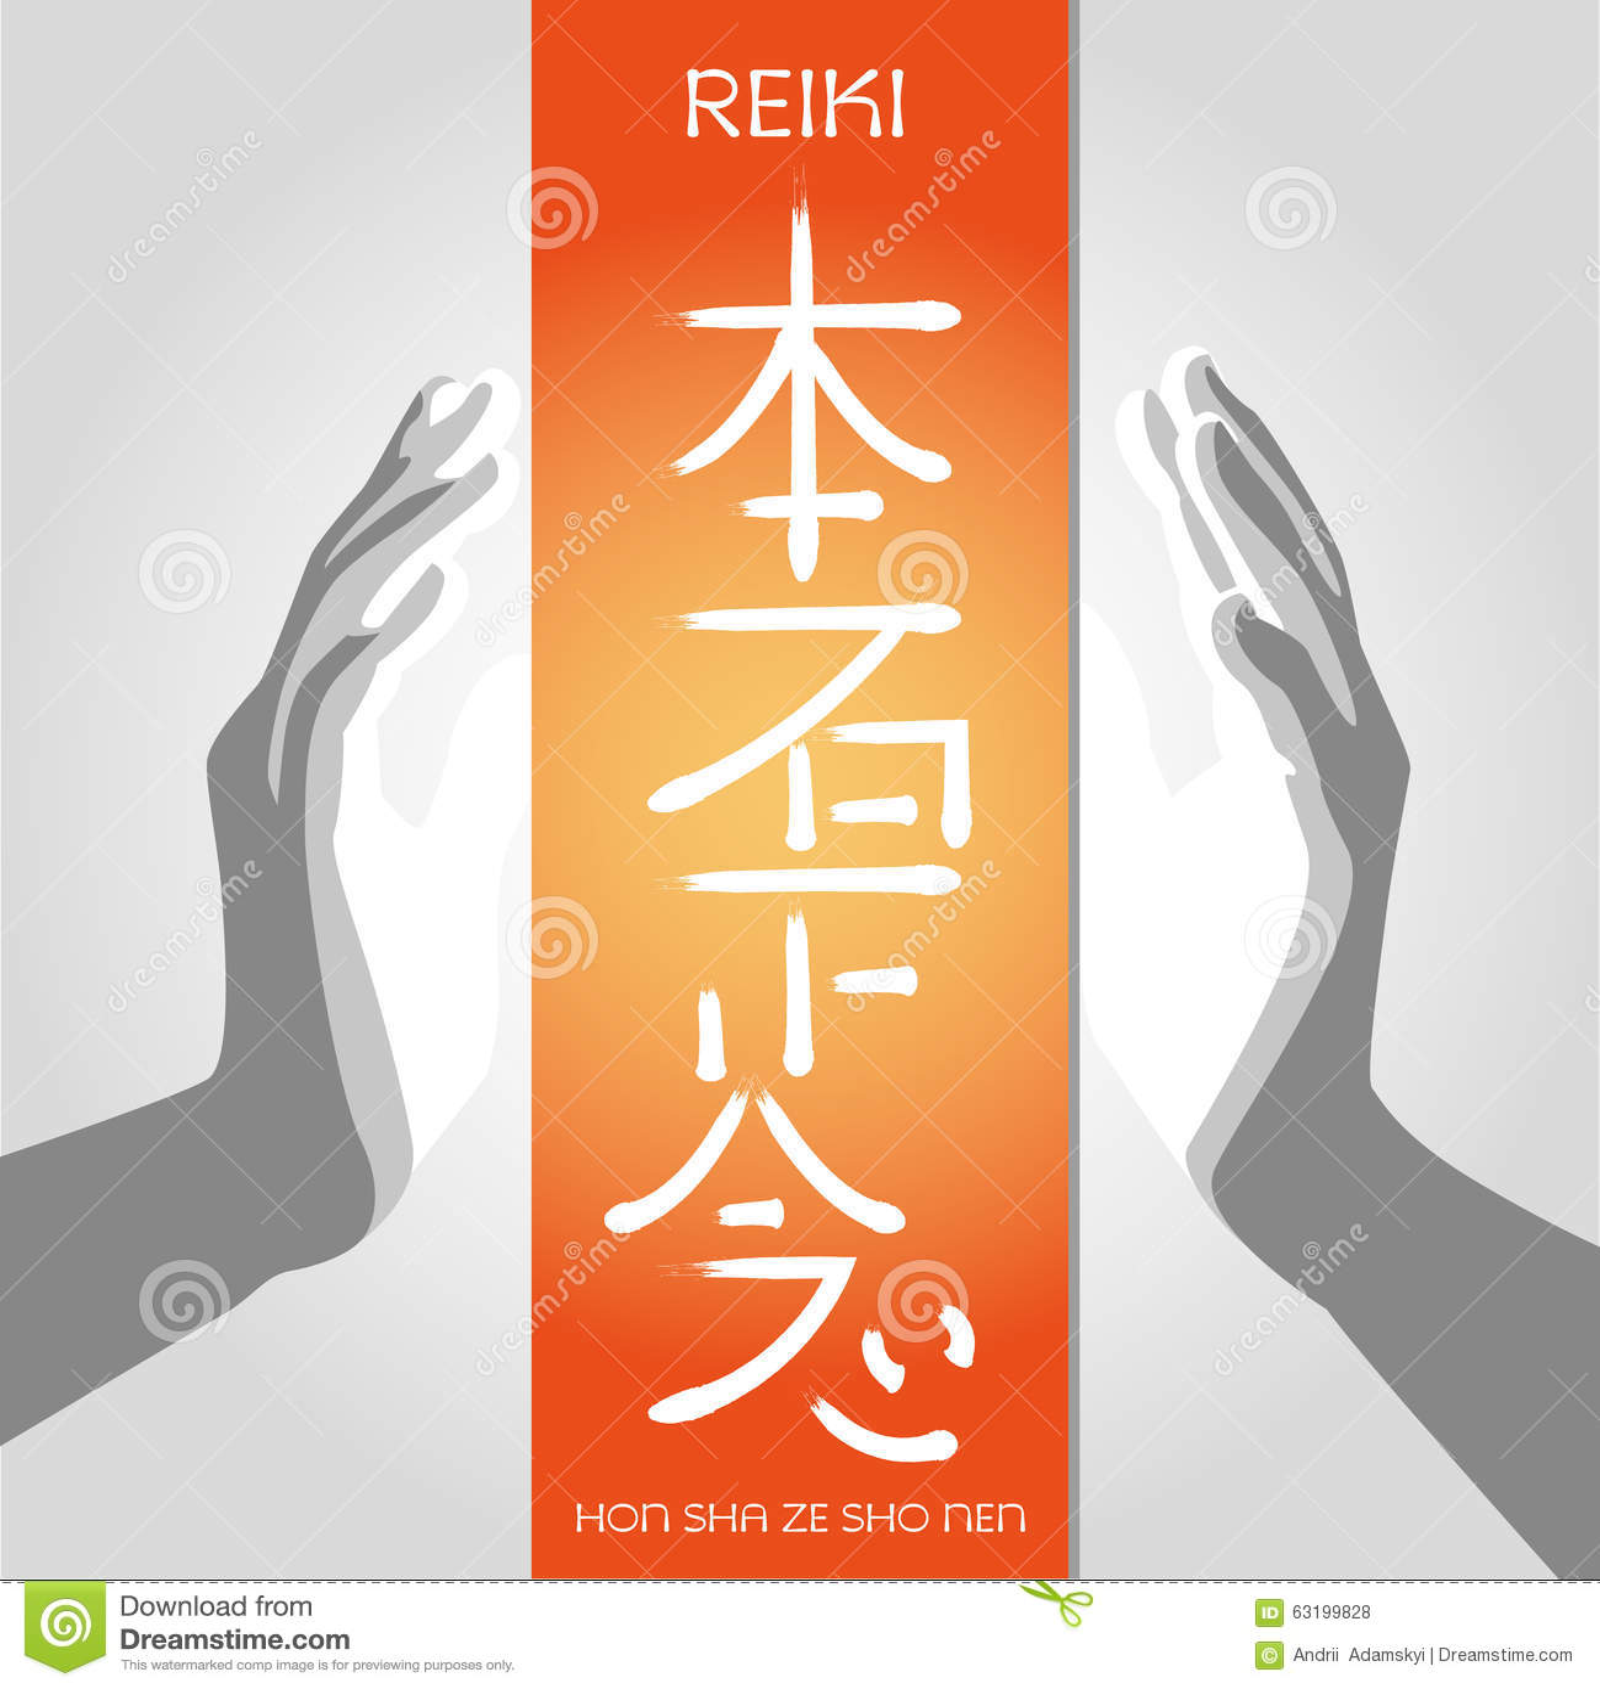 Reiki Symbols Hon Sha Ze Sho Nen Stock Vector Illustration Of